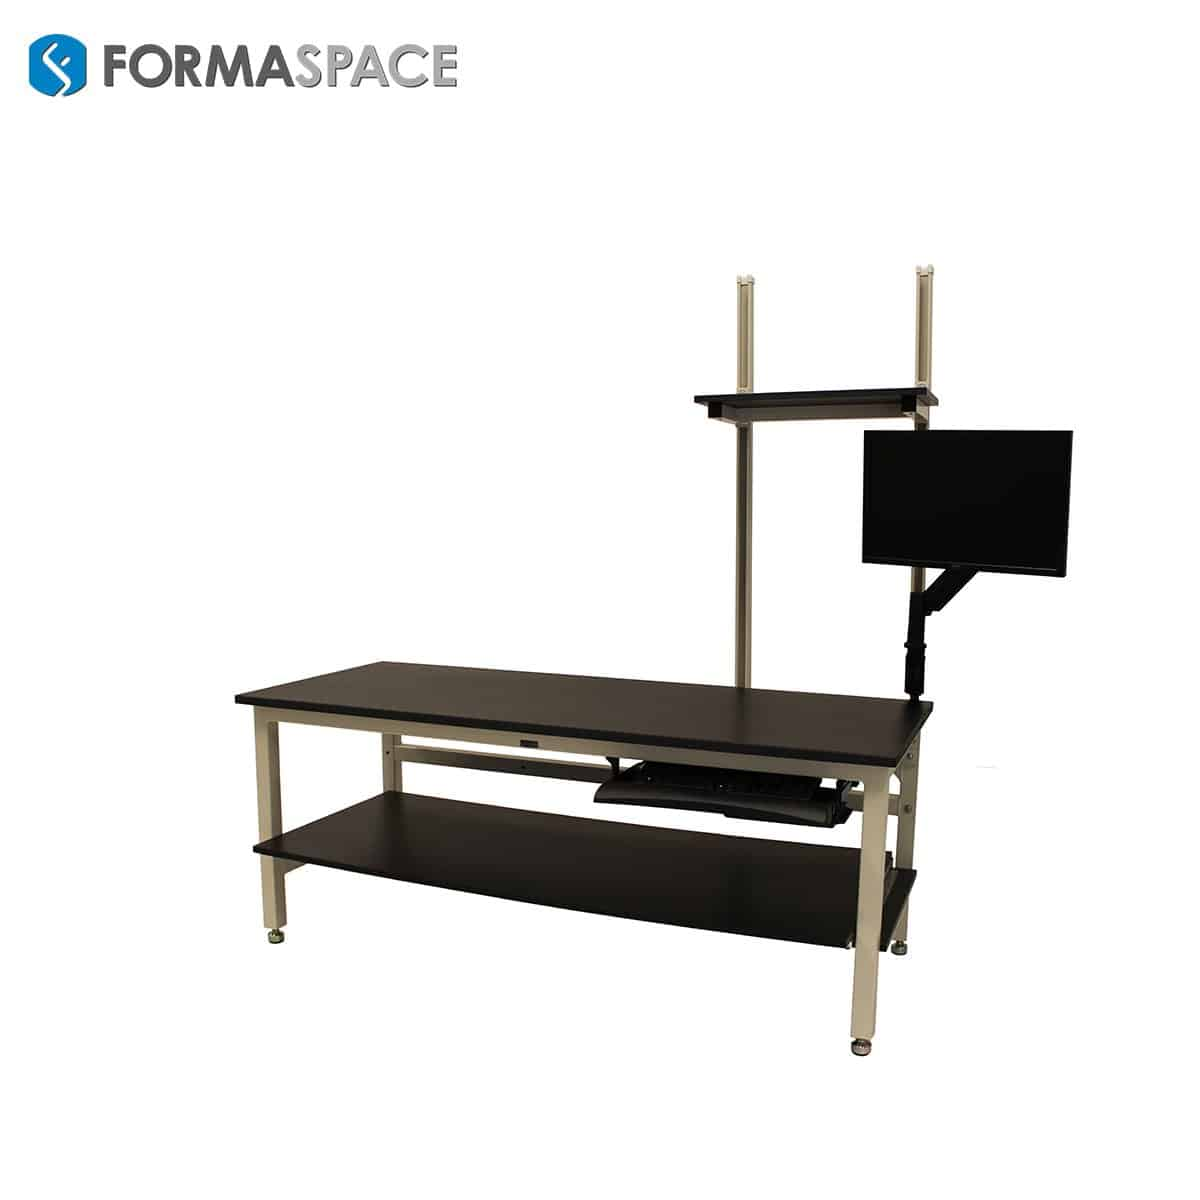 Custom Computer Workstation with Lower & Upper Shelves